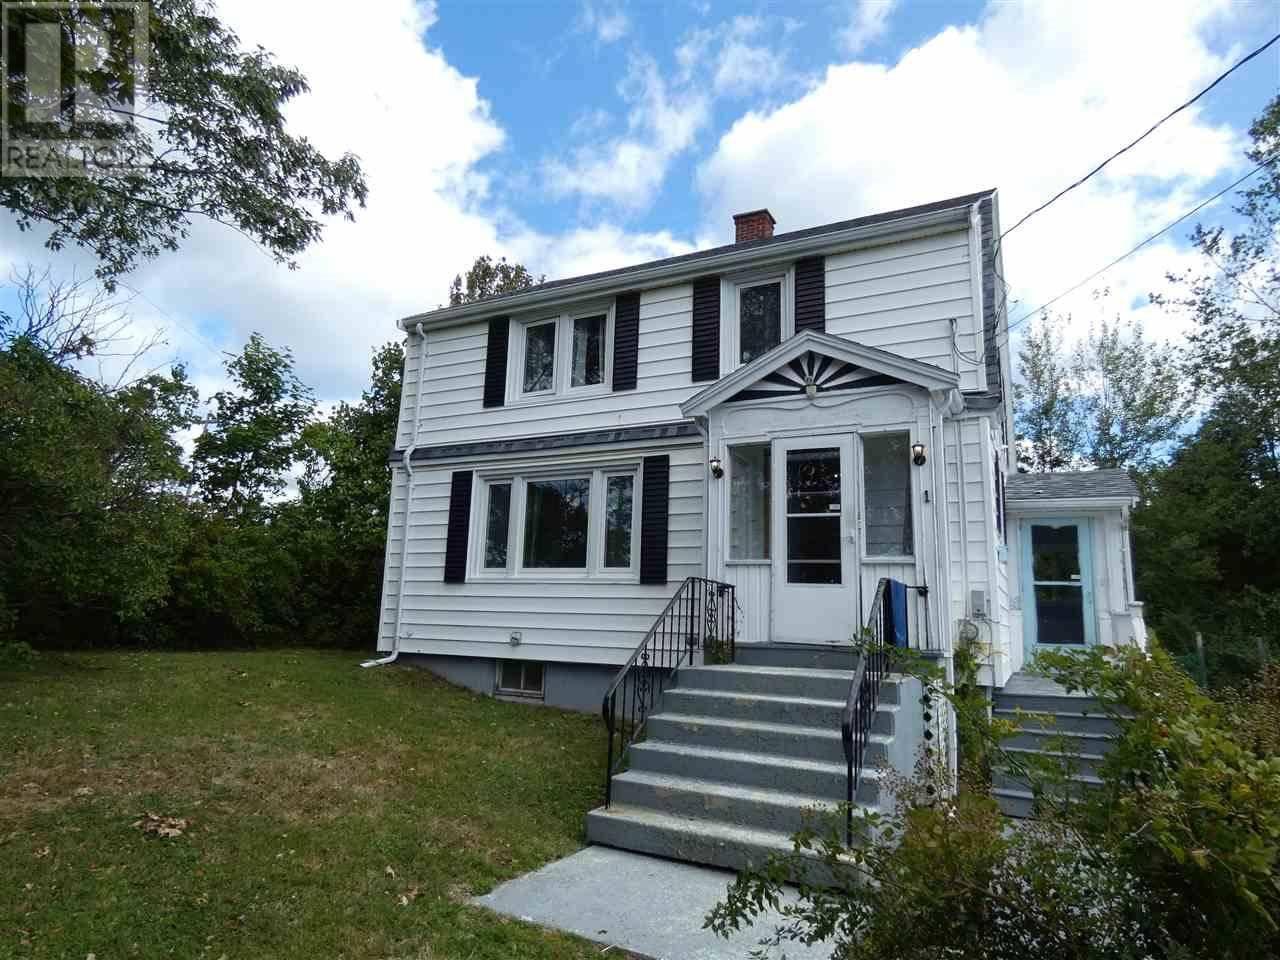 House for sale at 1 Farquharson St Dartmouth Nova Scotia - MLS: 201922245